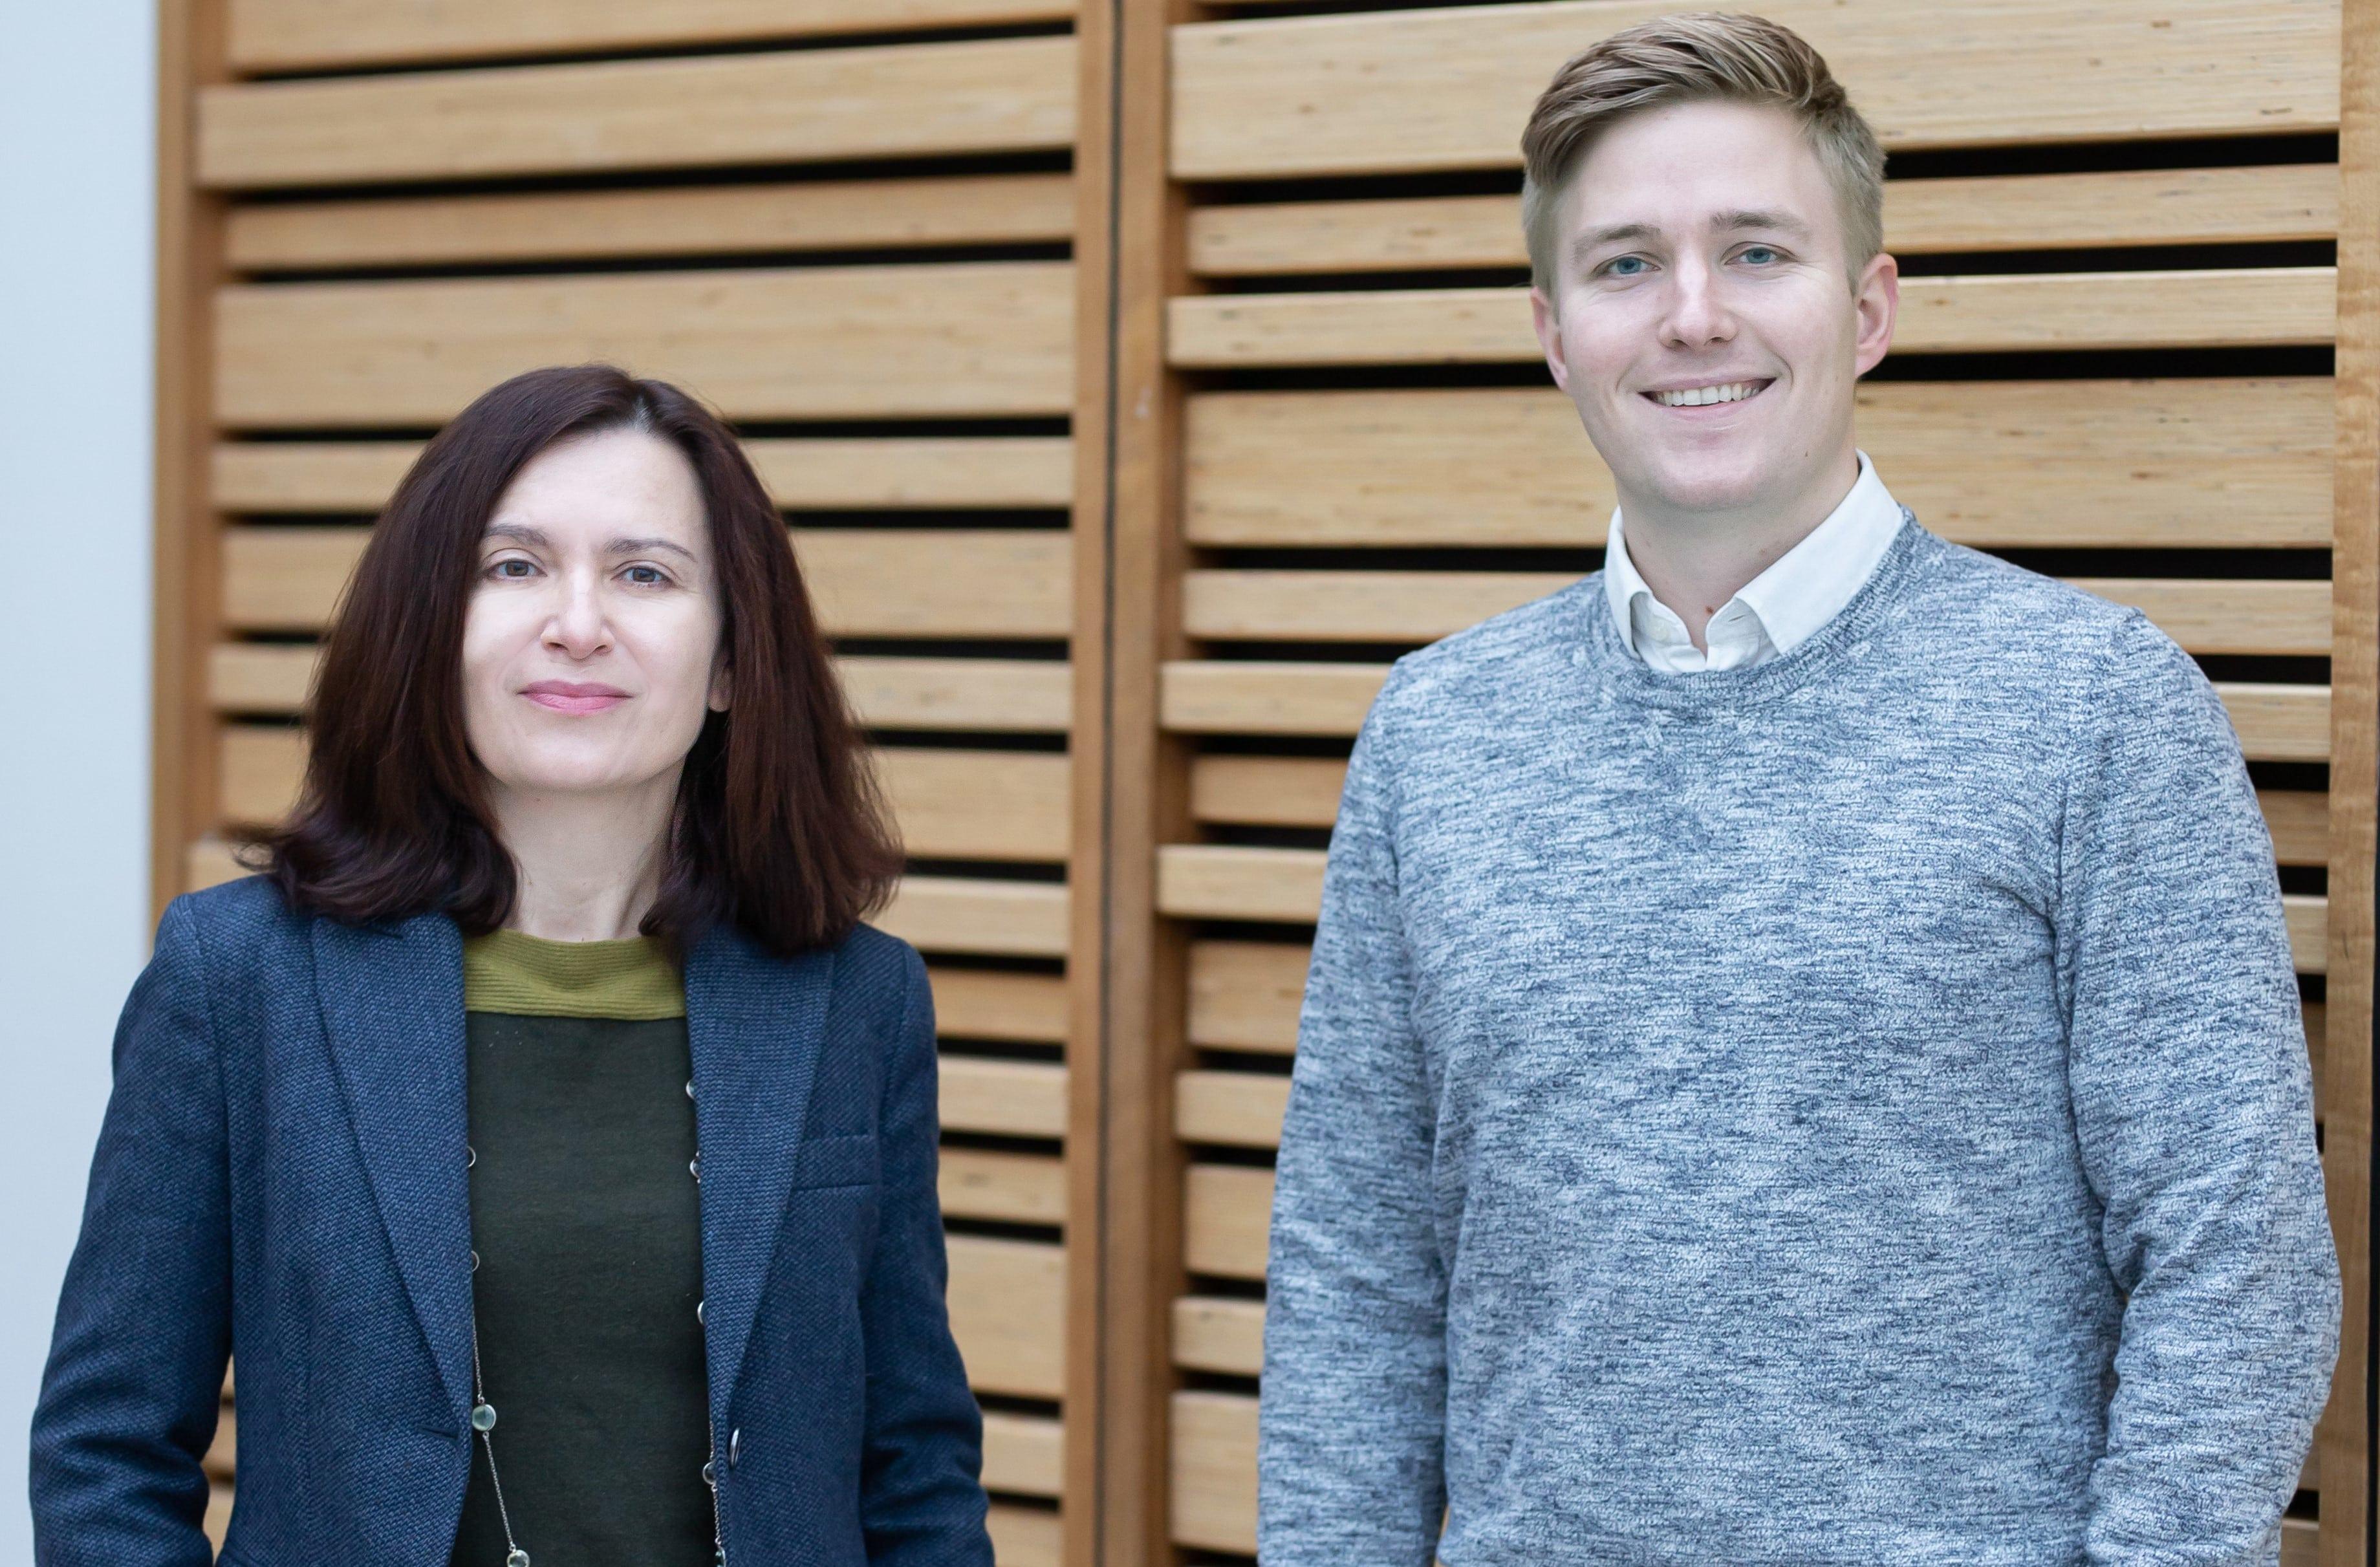 Anna Hammershøy og Dennis Grauslund, Professionshøjskolen UCN. (Foto: Angelika Anna Smuda)